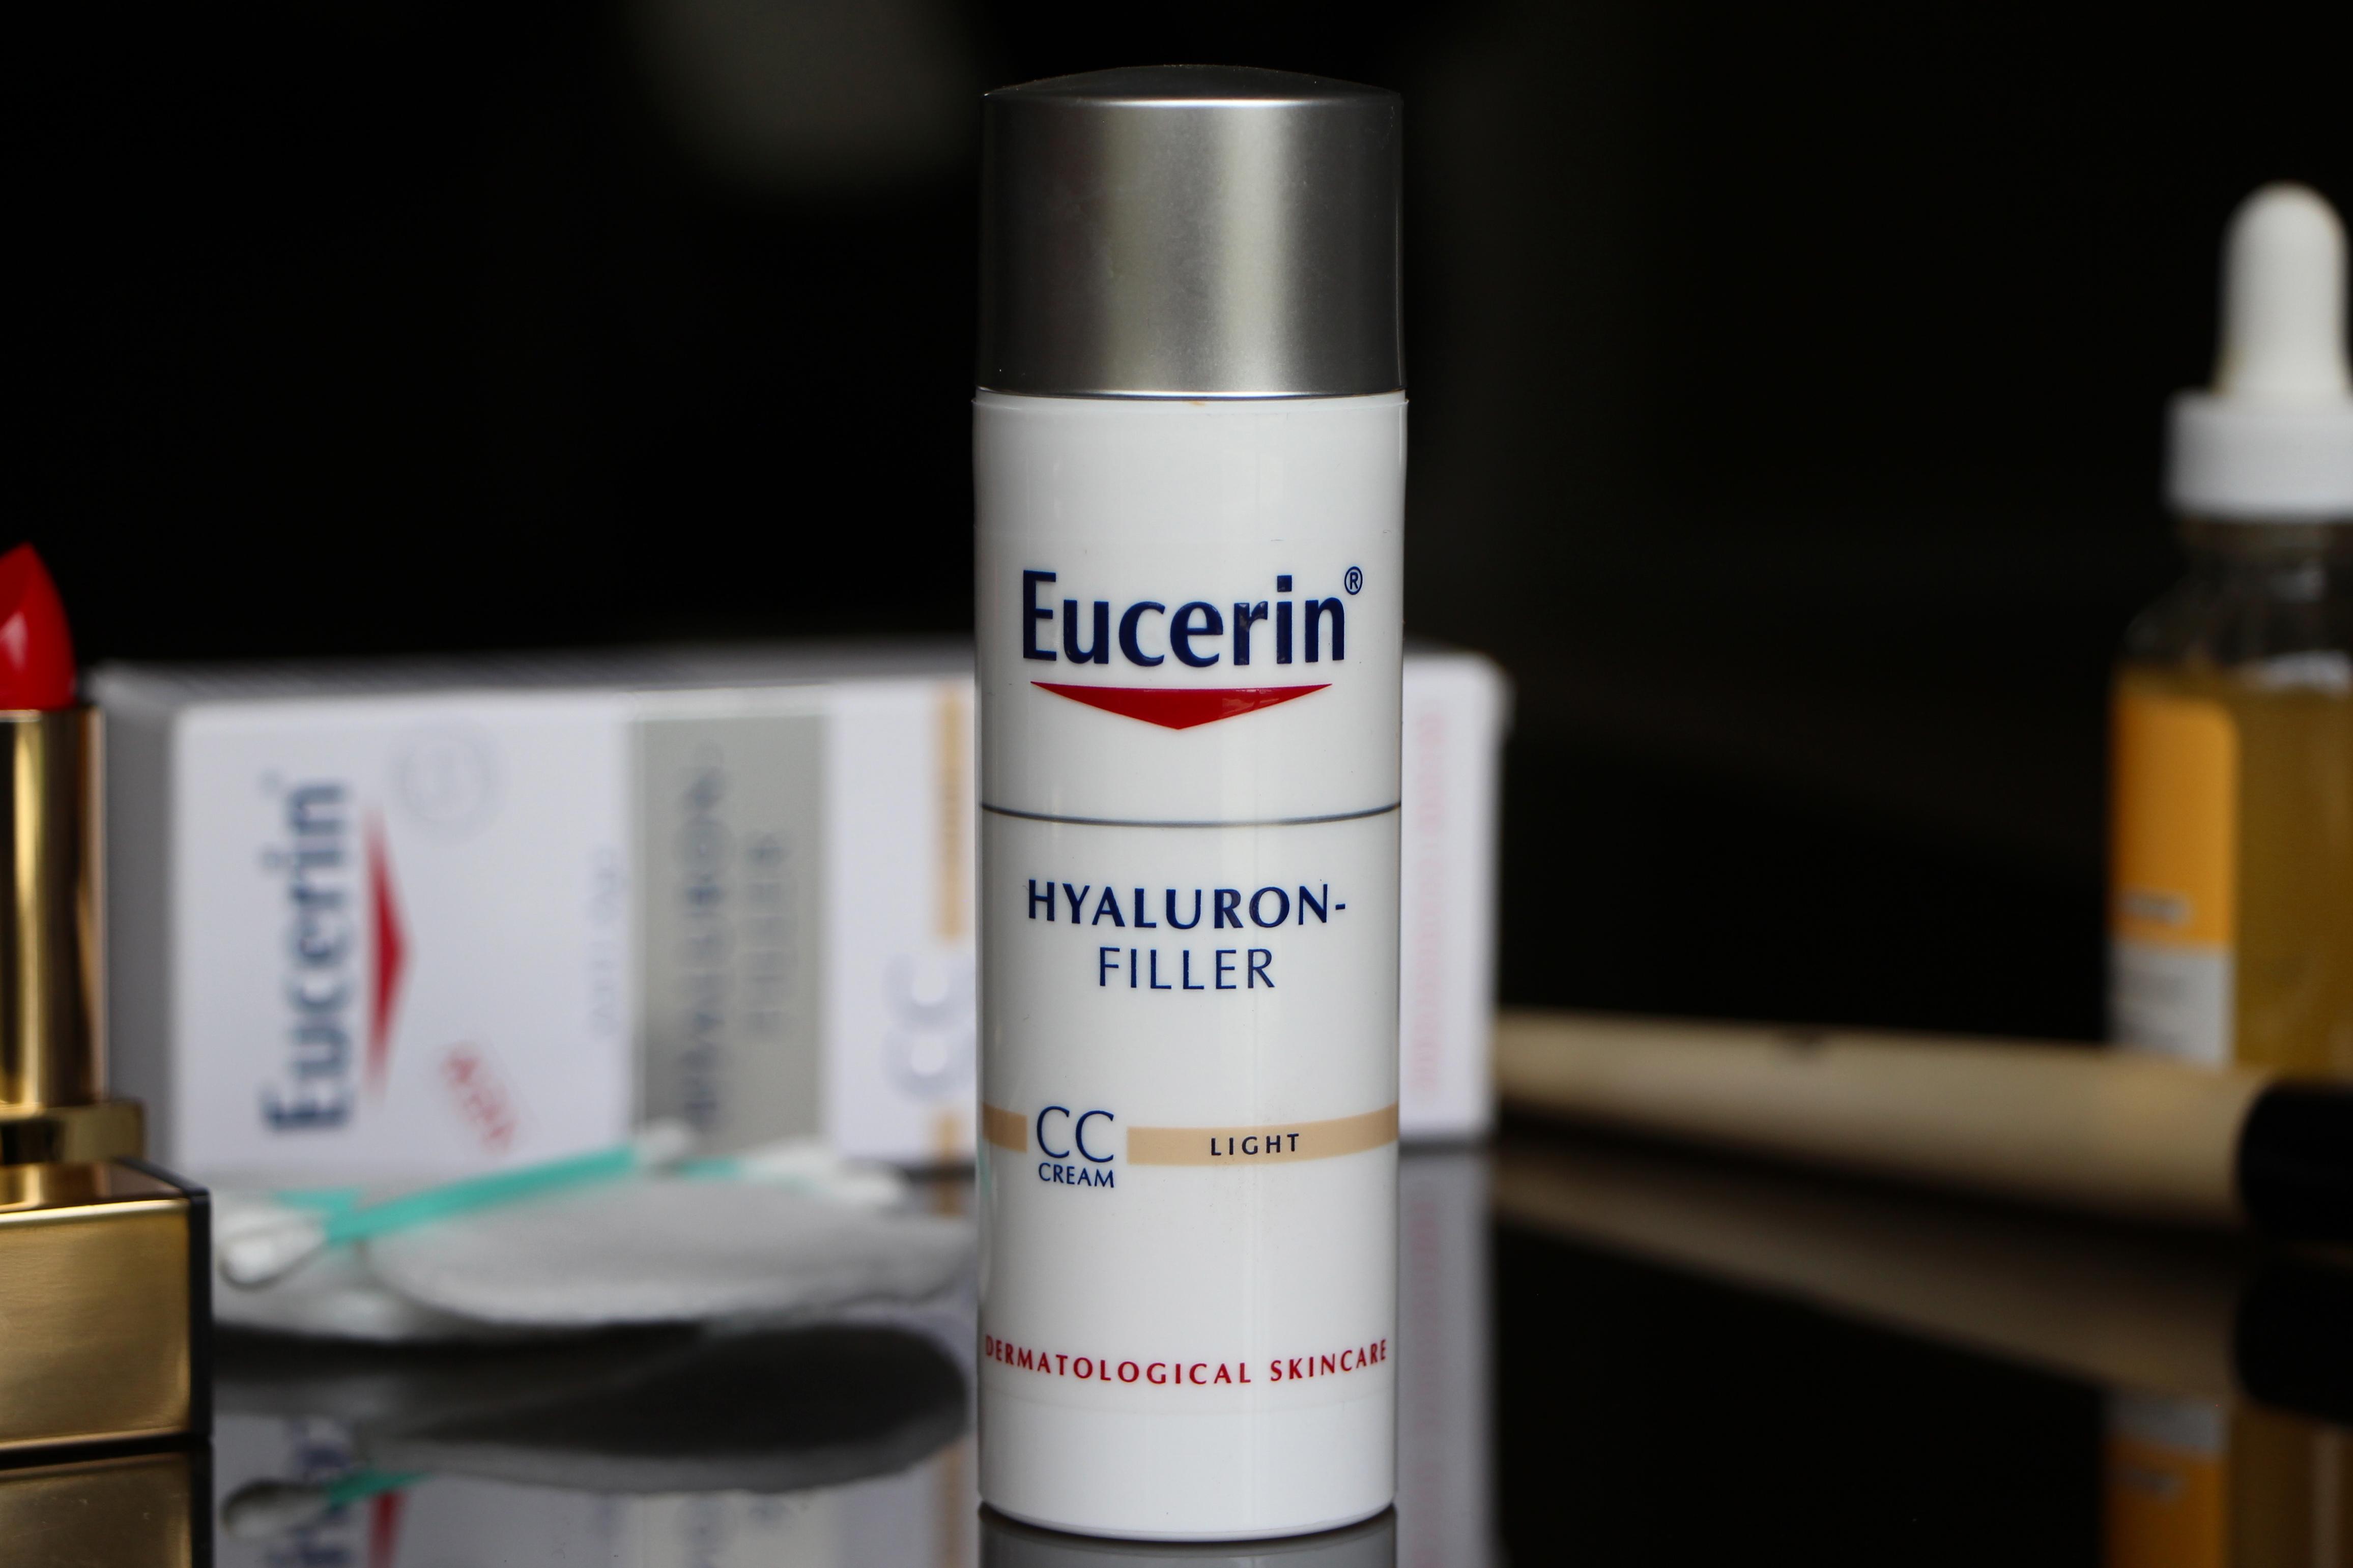 trial eucerin hyaluron filler cc cream ad a model recommends. Black Bedroom Furniture Sets. Home Design Ideas